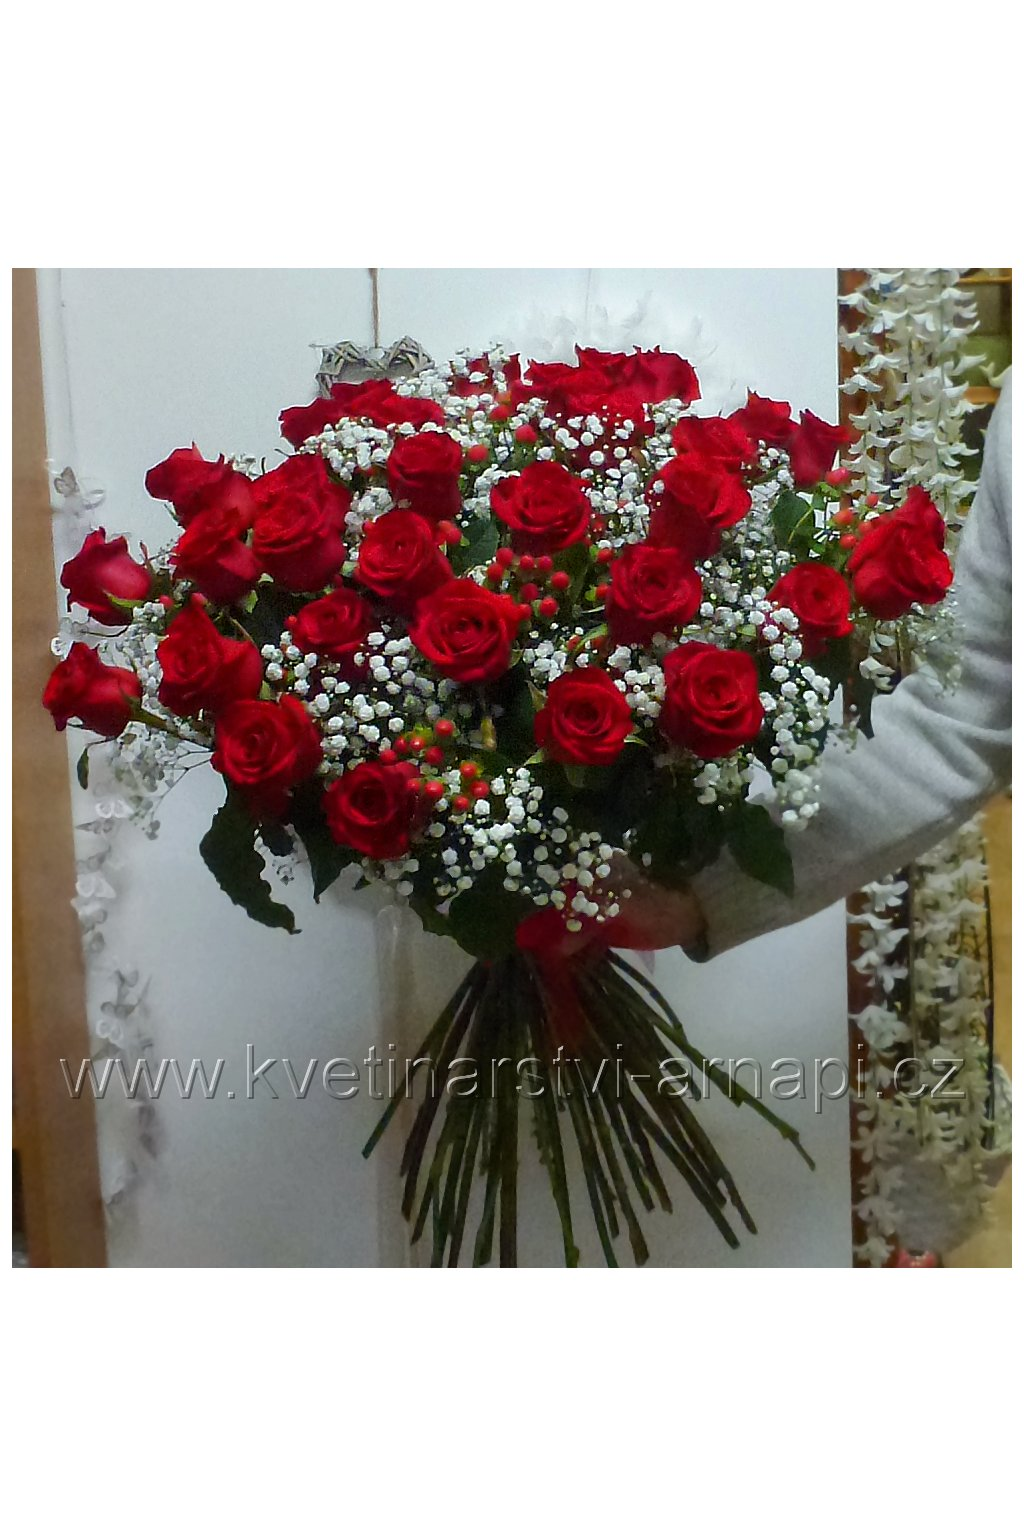 kytice ruzi cervenych kvetinarstvi arnapi